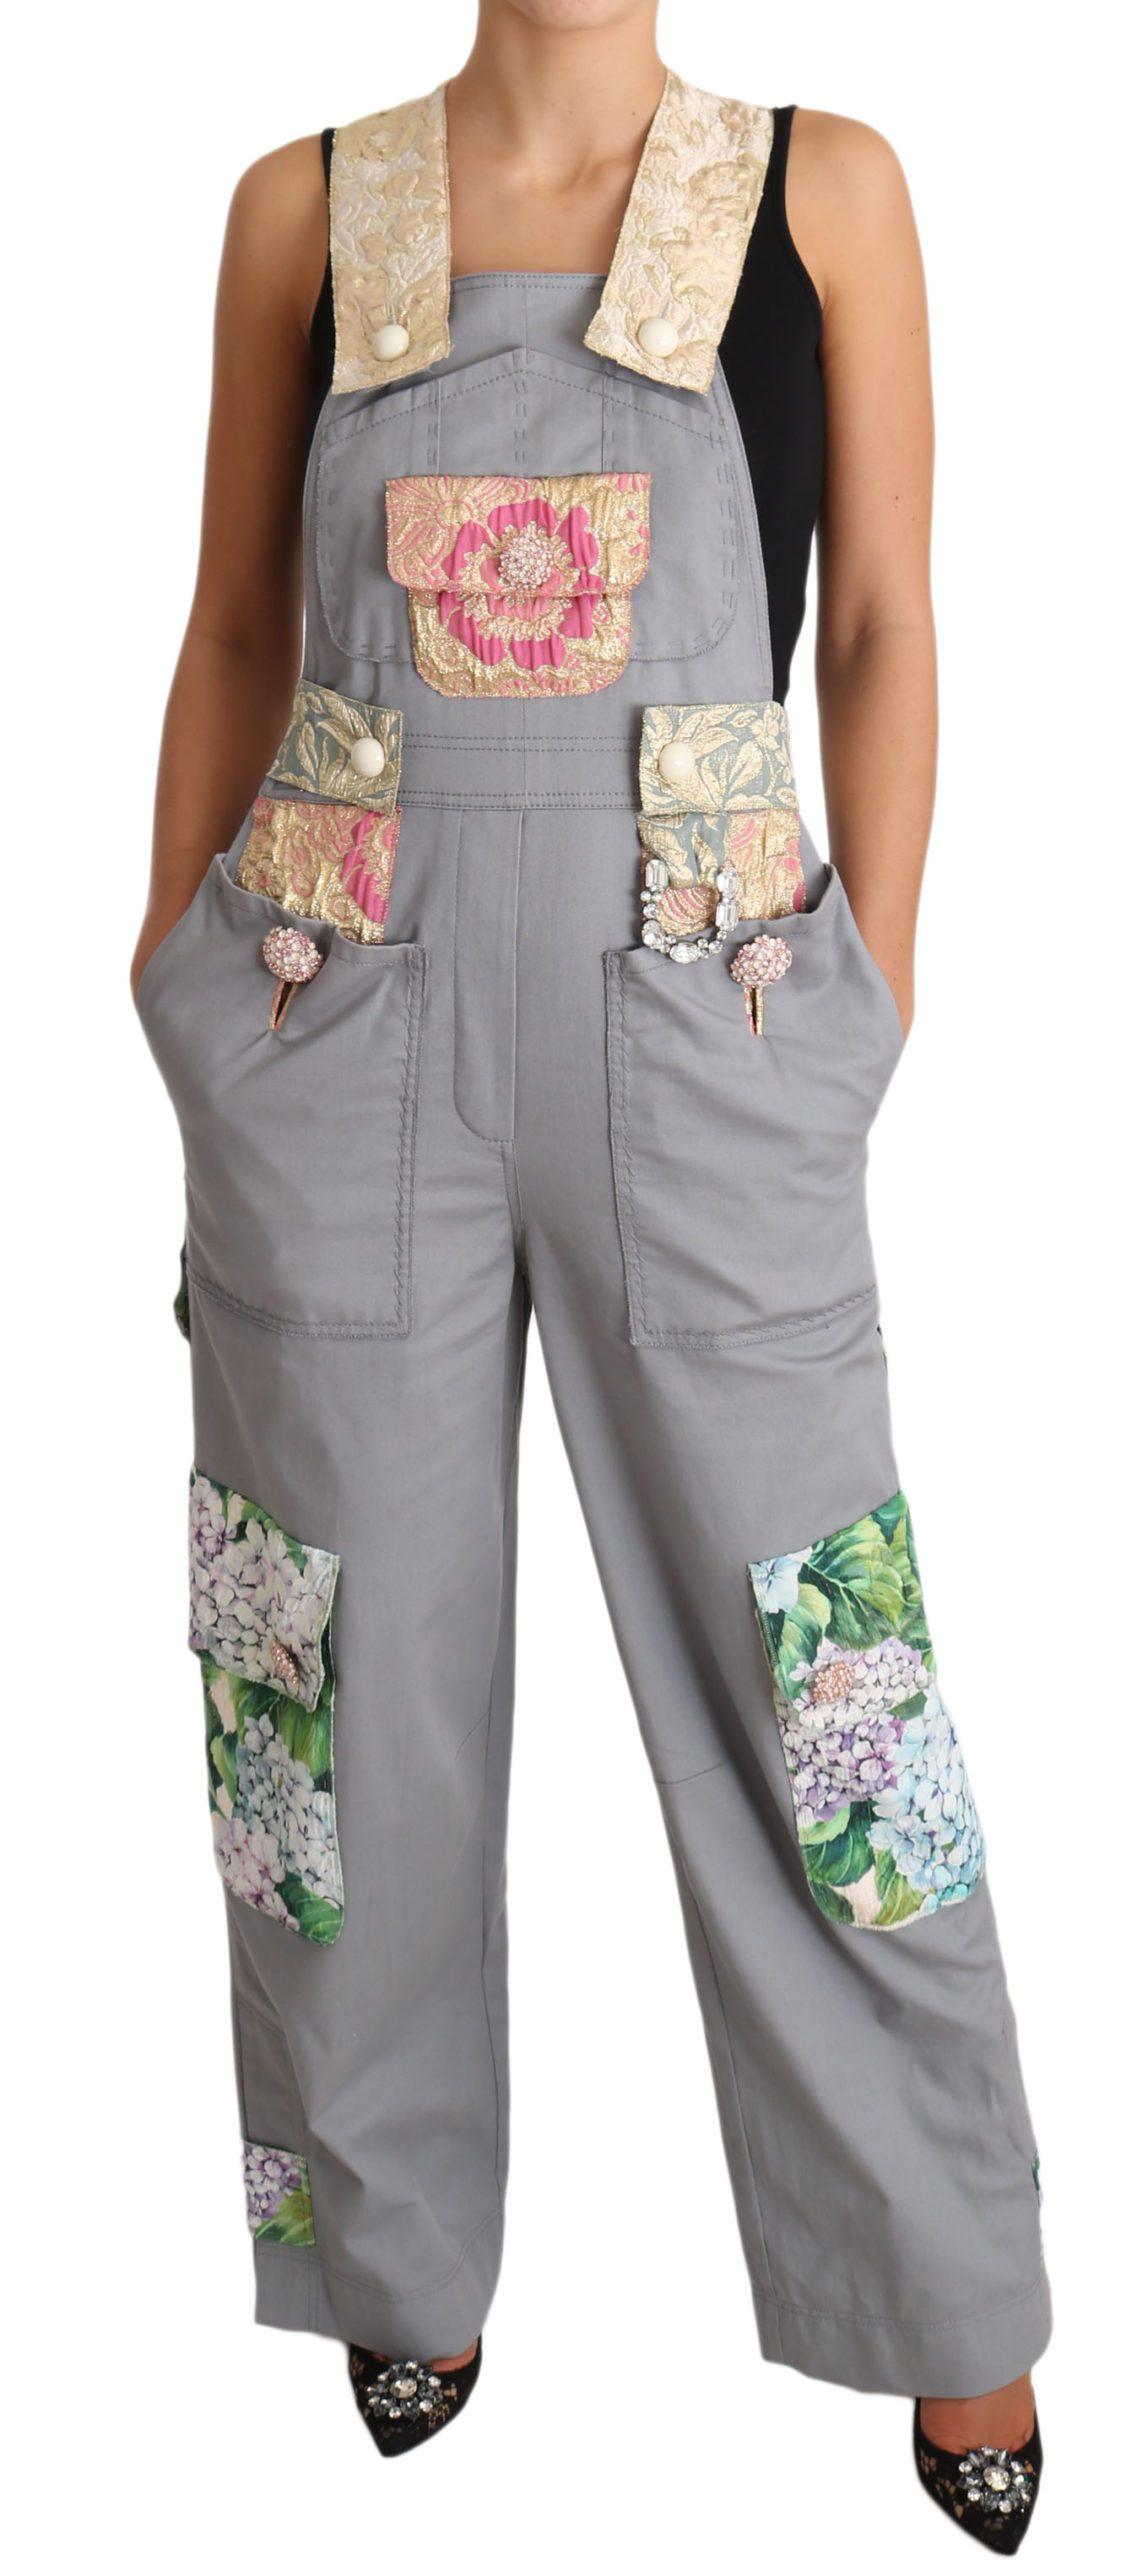 Dolce & Gabbana Women's Overall Denim Crystal Hortensia Jeans Pink TSH3407 - IT40|S